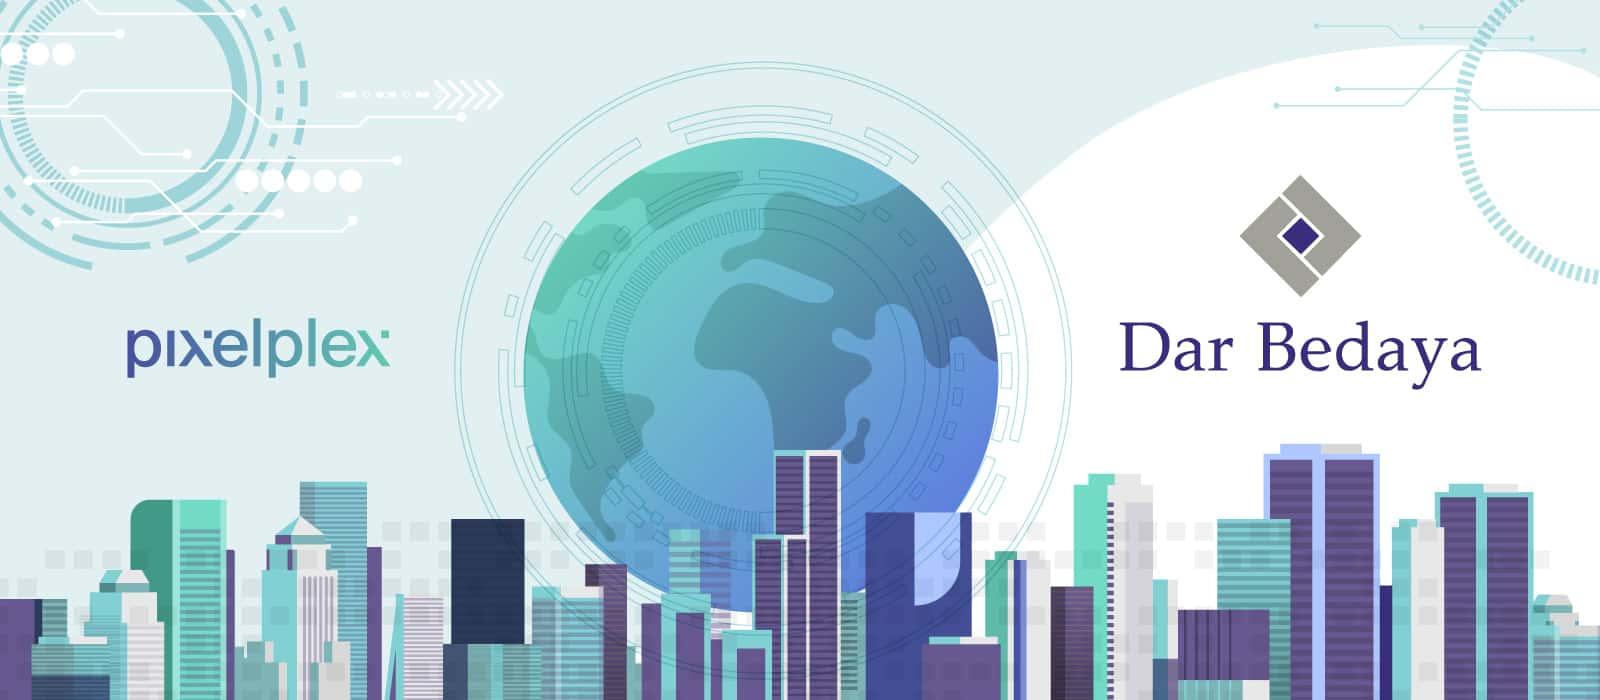 PixelPlex and Dar Bedaya Partnership Announcement